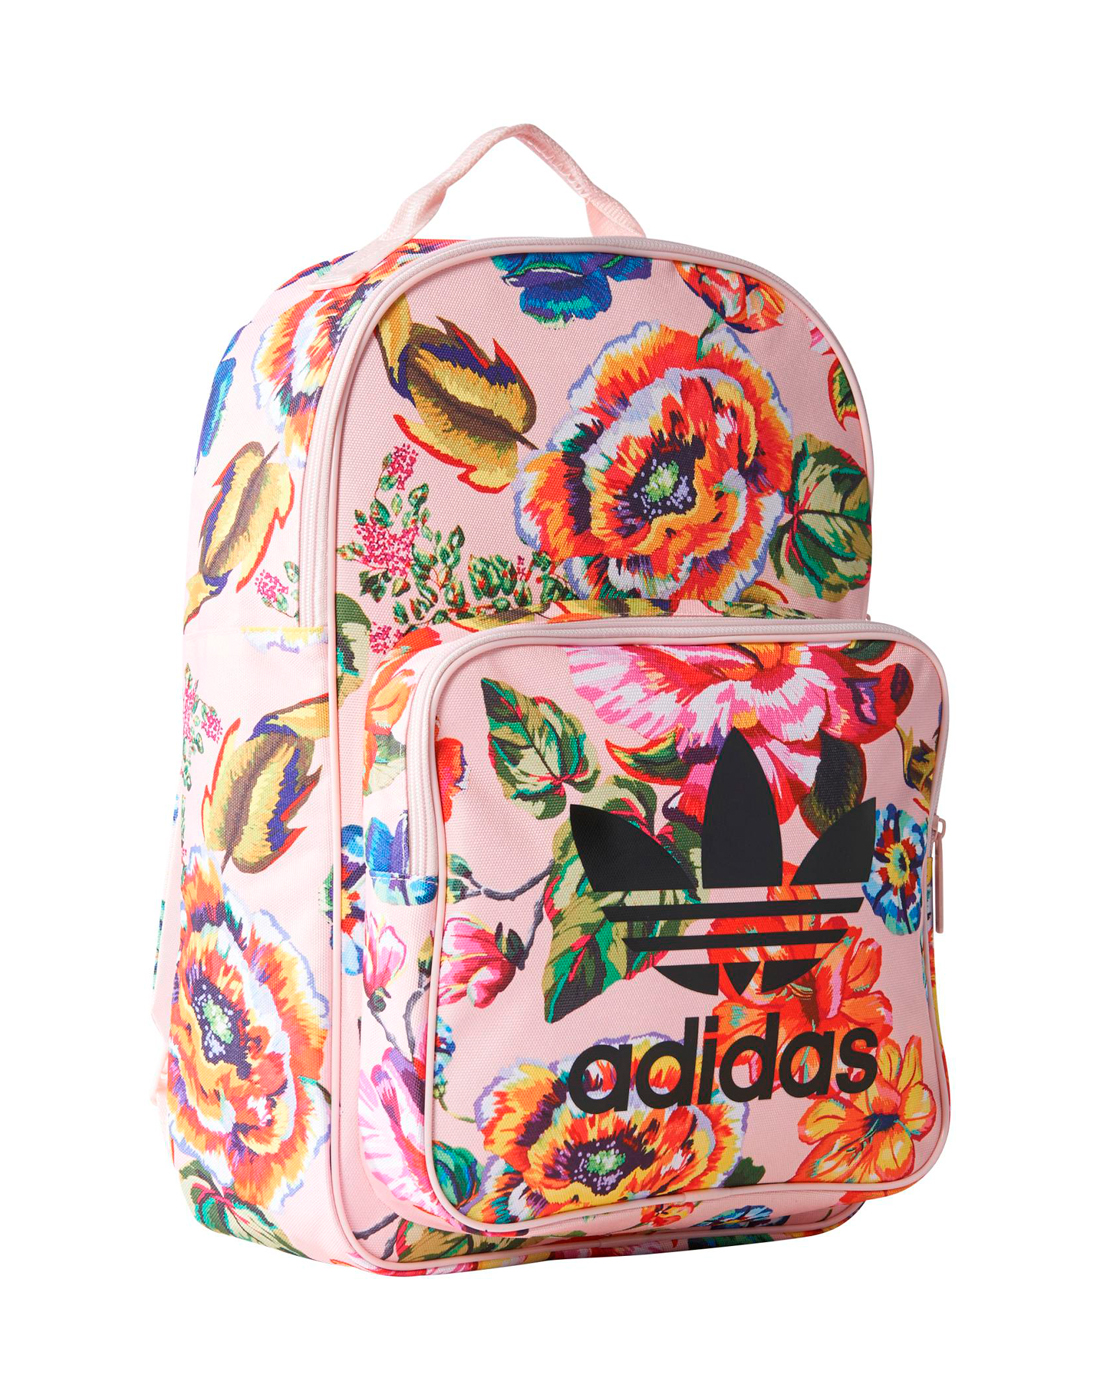 25a2c0768fd5 Floral Backpack · Floral Backpack · Floral Backpack